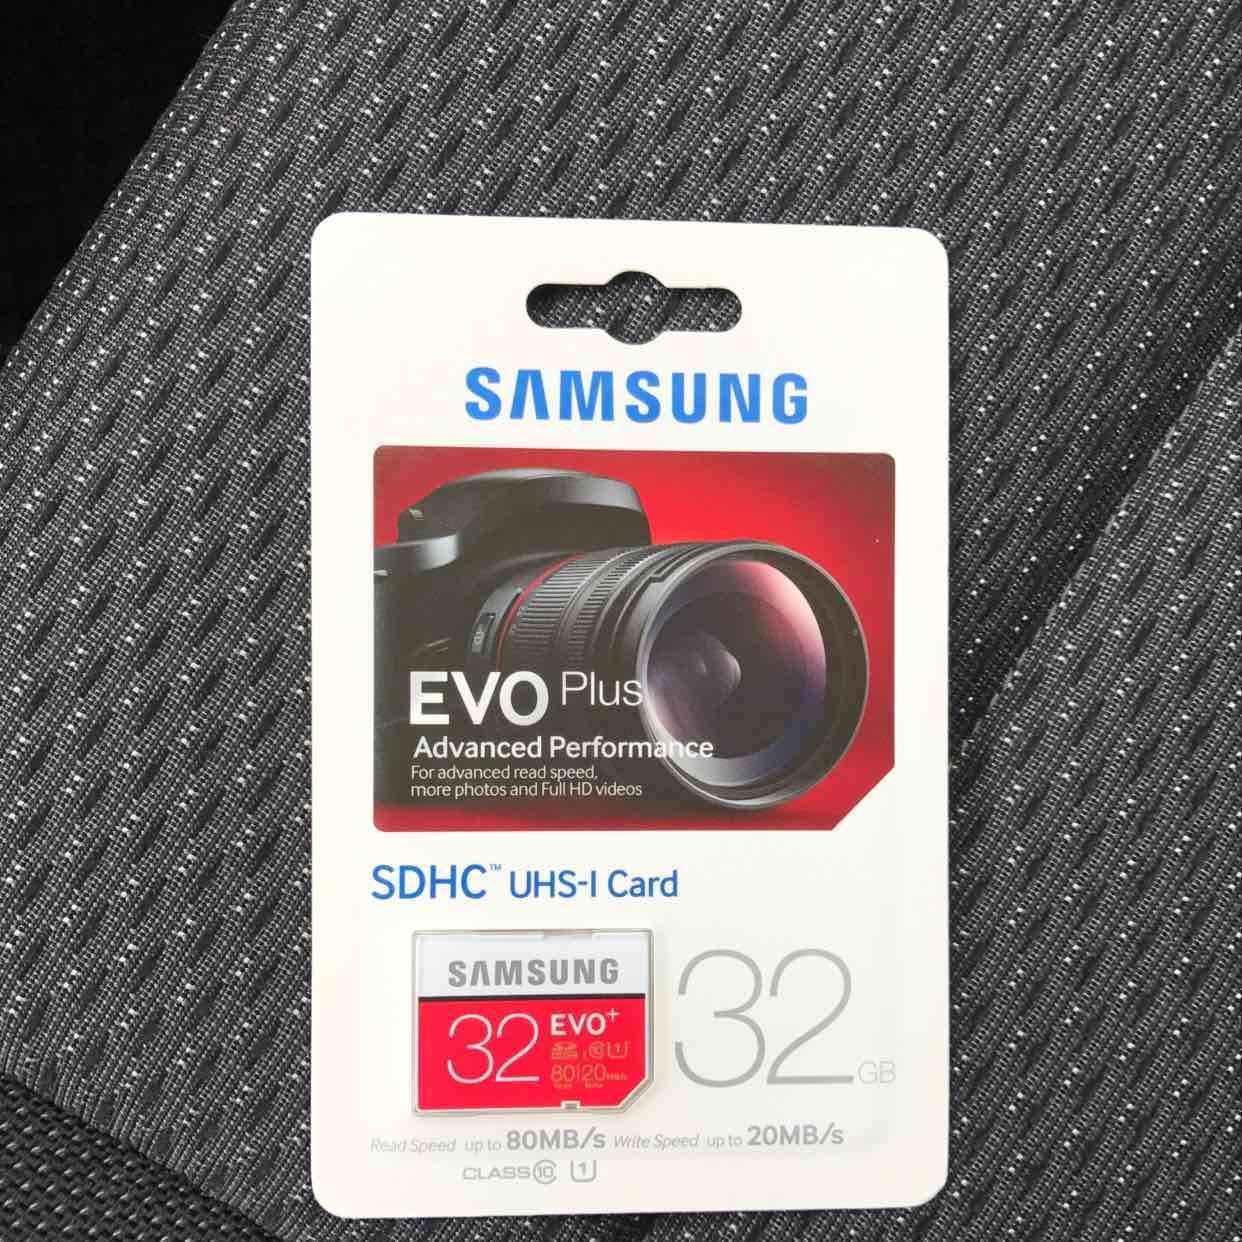 [Lokal Voerde] Samsung SDHC UHS-I Card MB-SC32D 32 GB für 9,99 Euro